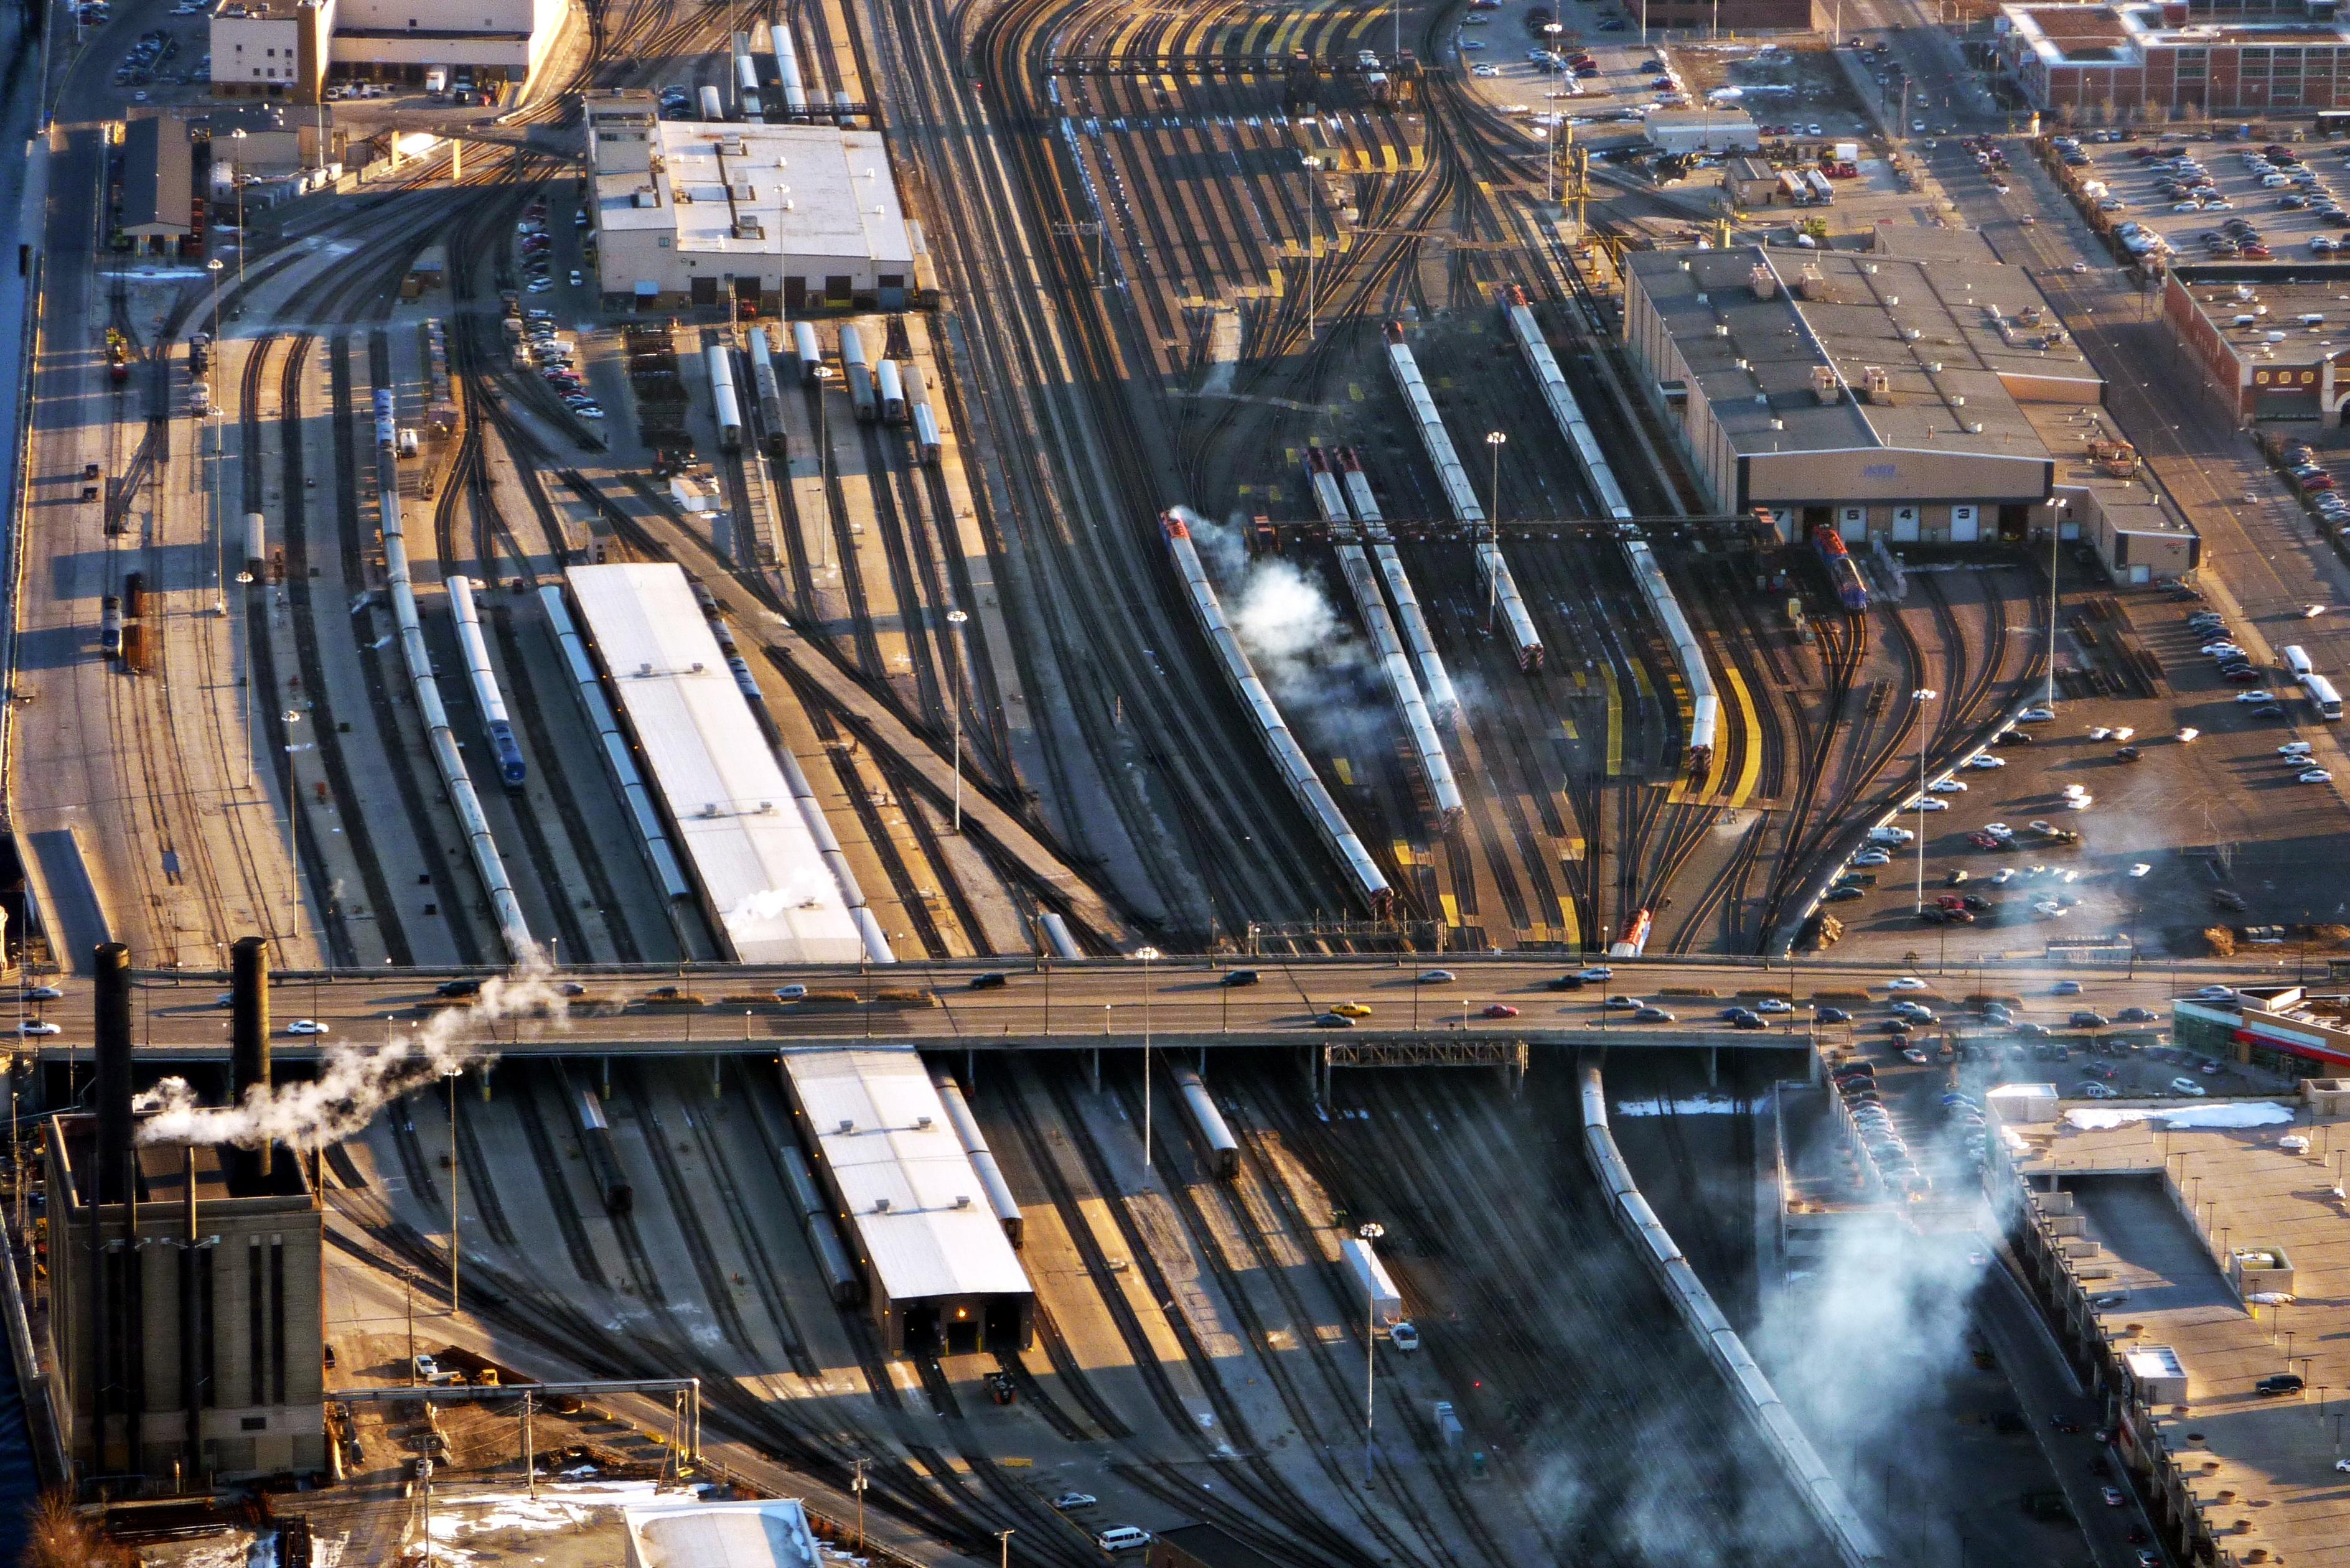 Rail yard - Wikipedia